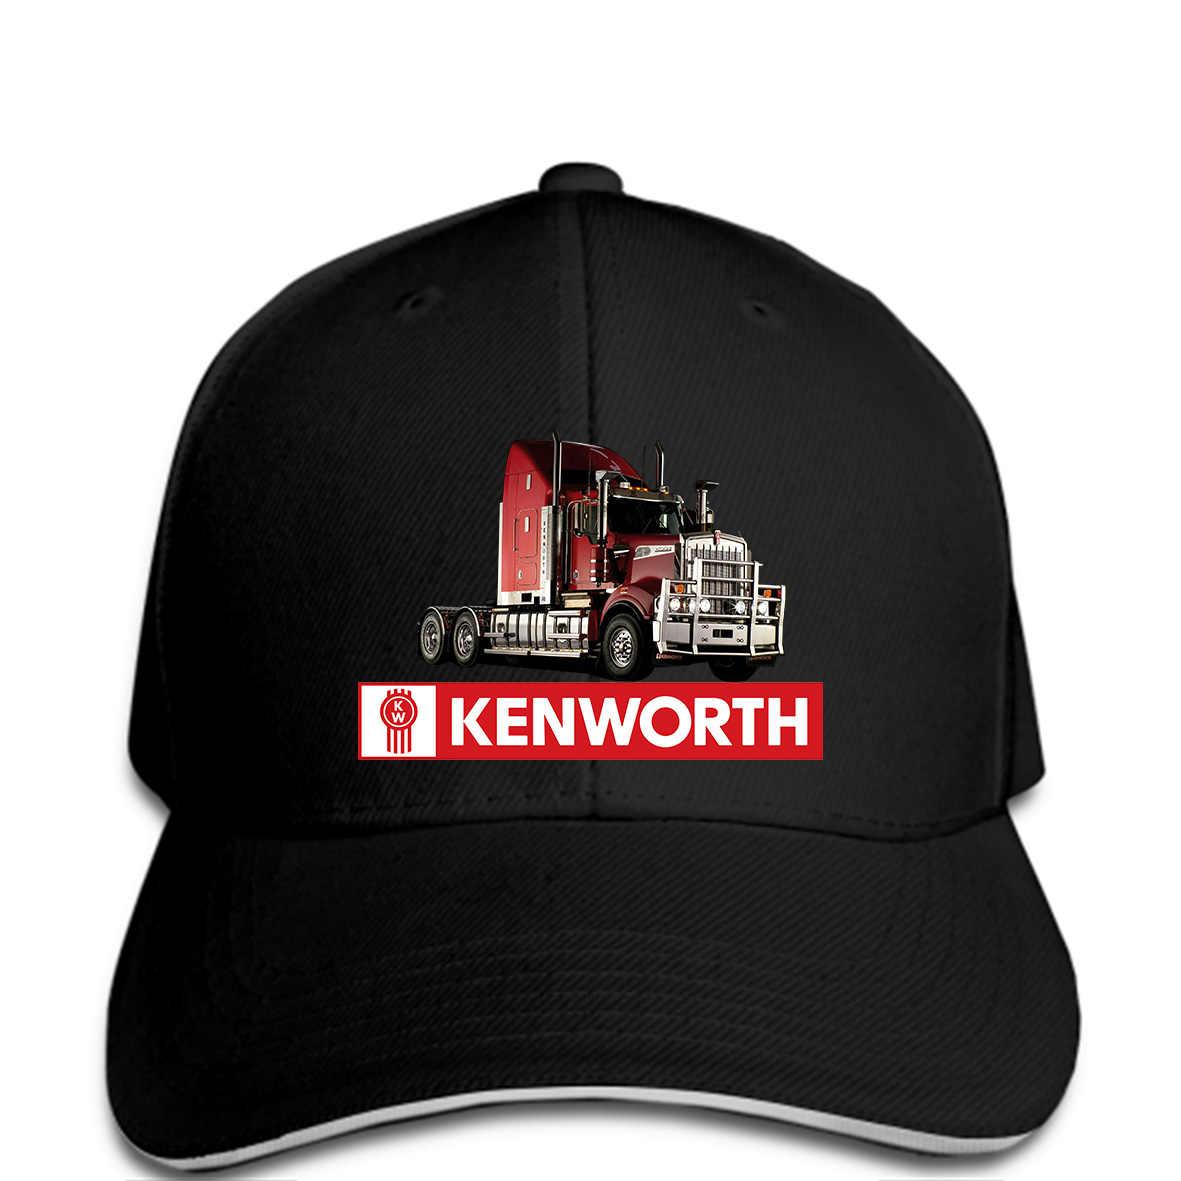 9d609ae7ccc424 Detail Feedback Questions about Men Baseball cap New Fashion Popular  Kenworth Truck Peterbilt Black L funny Hat novelty tsnapback women1 on  Aliexpress.com ...